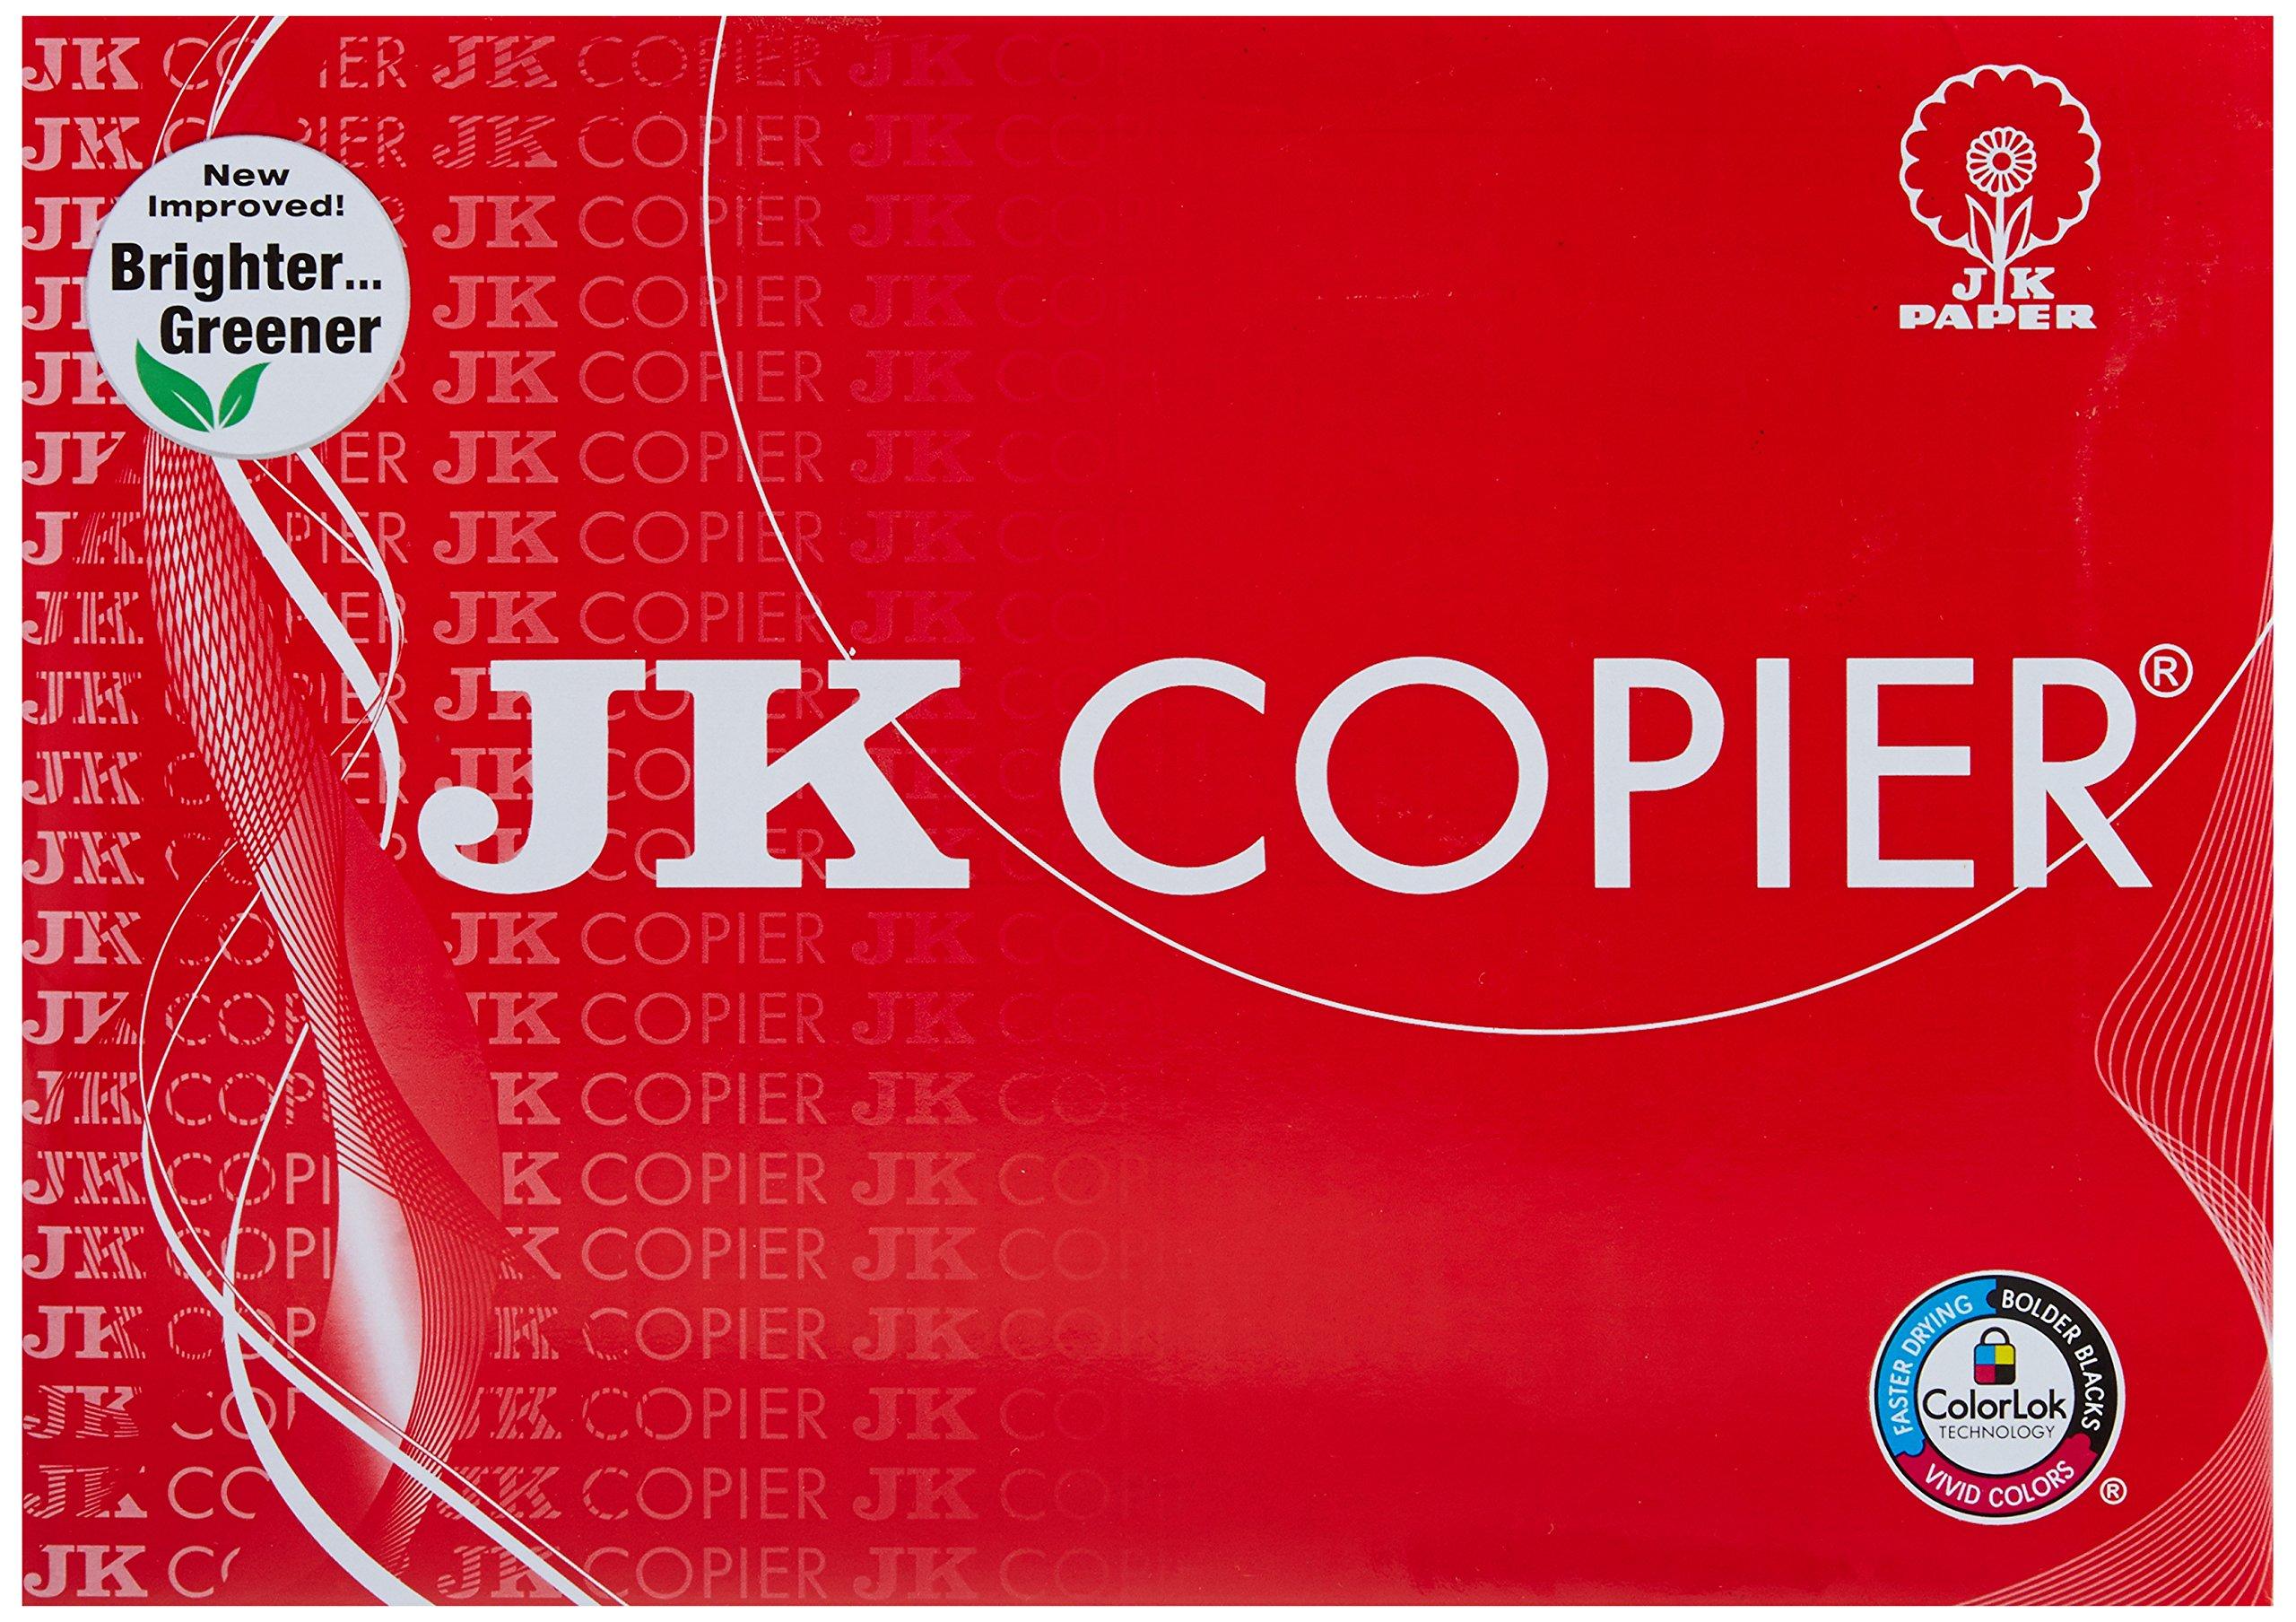 JK Copier Paper - A4, 500 Sheets, 75 Gsm, 1 Ream by JK